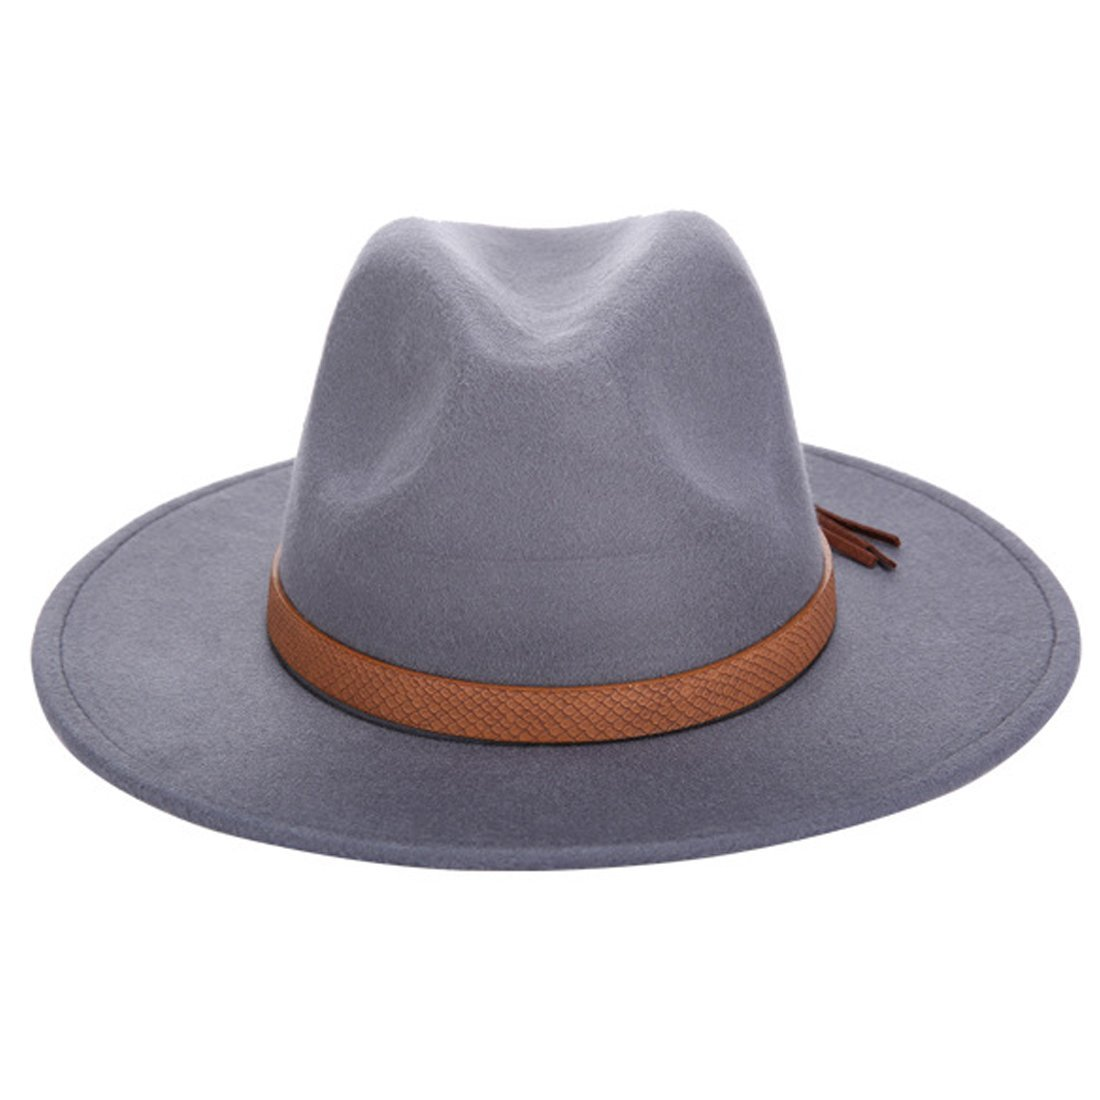 485ea8f4eb1 Get Quotations · Wide Brim Fedora Hat